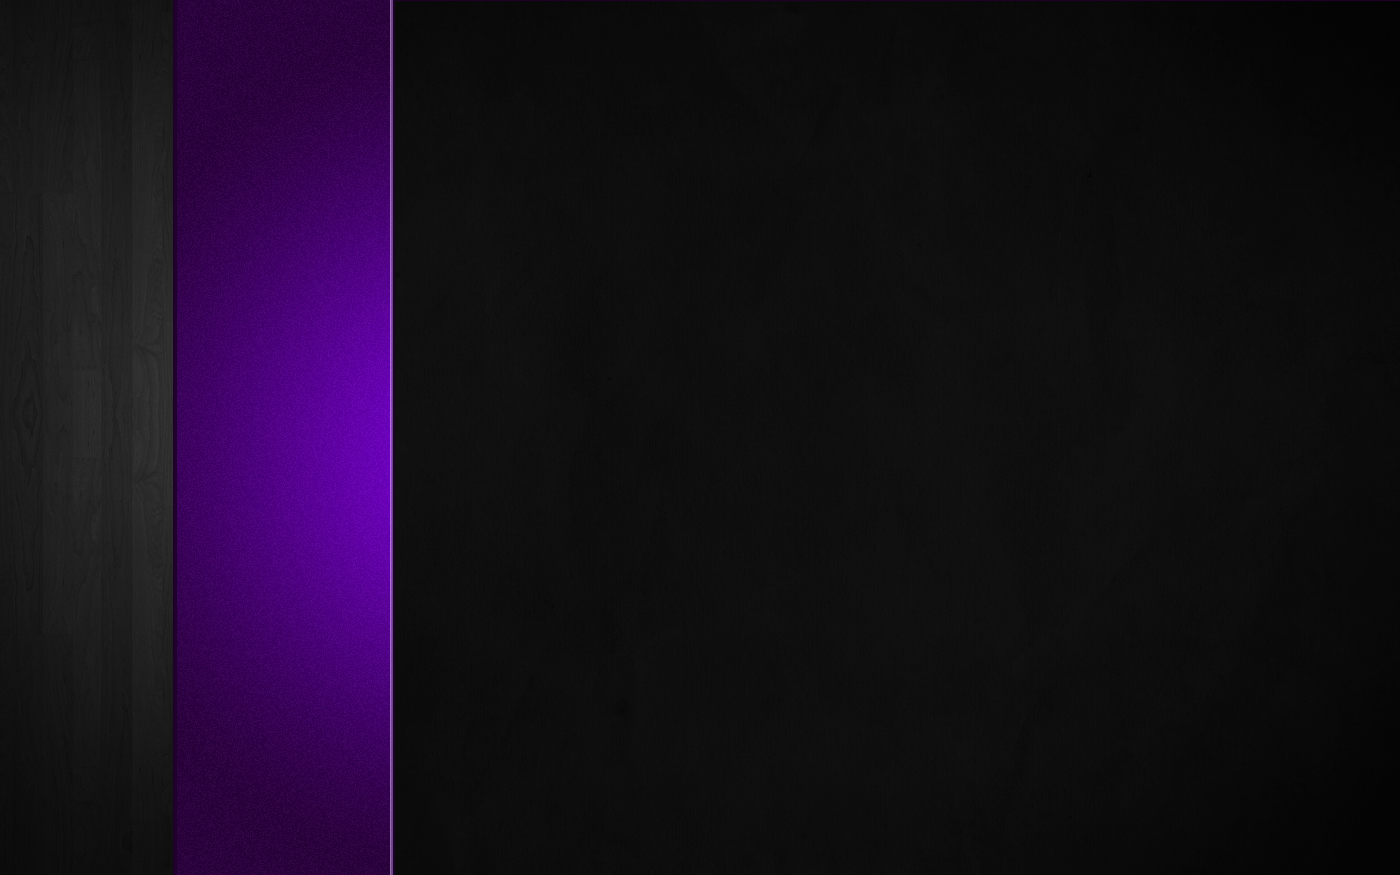 Dark Purple And Black Backgrounds Dark purple and black 1400x875